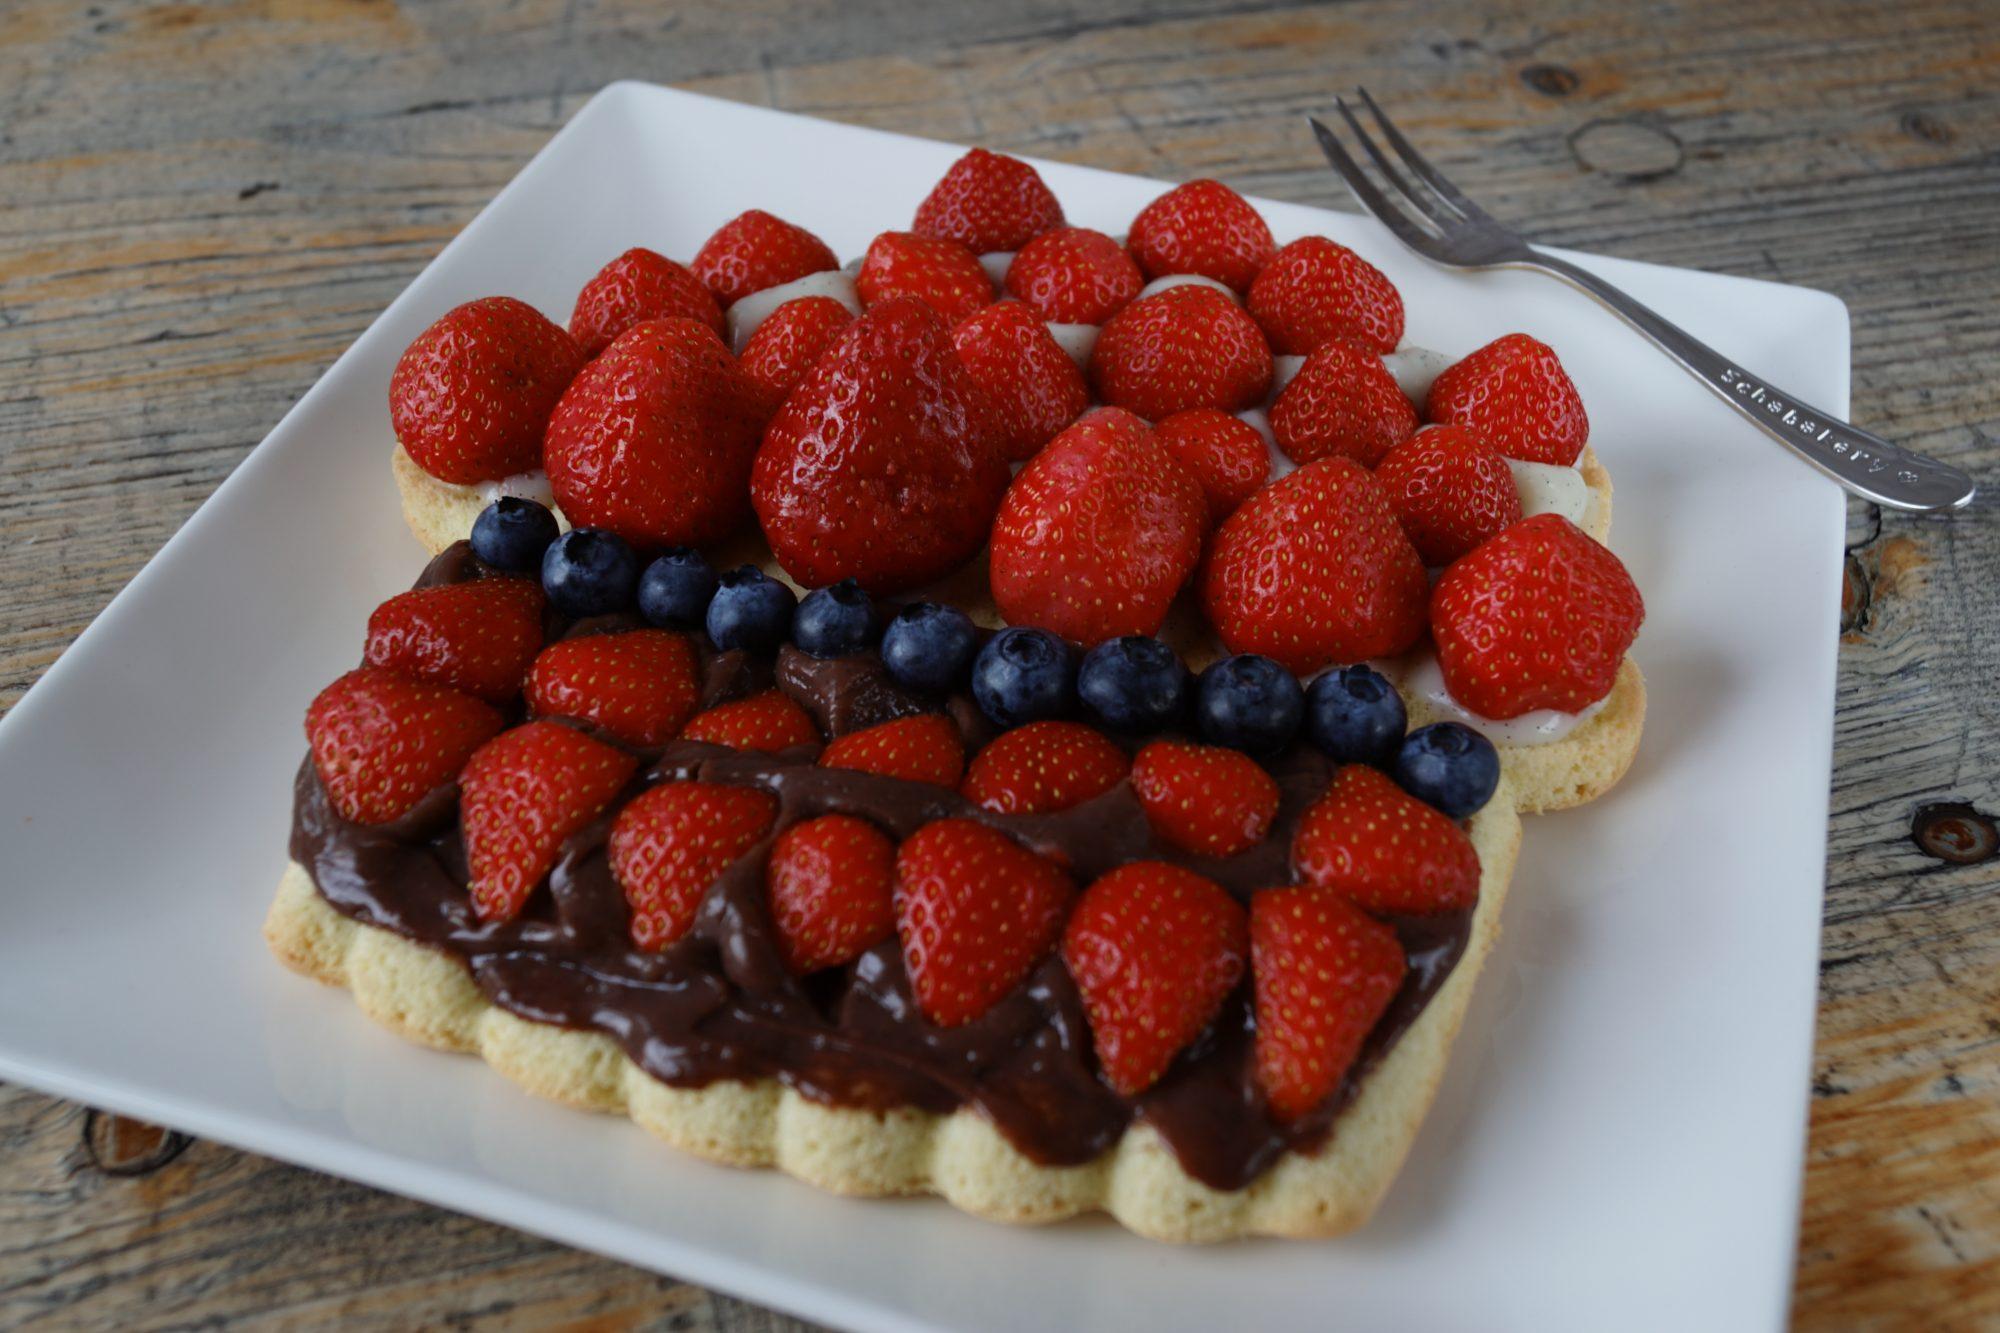 biscuit sponge with strawberries   schabakery.com